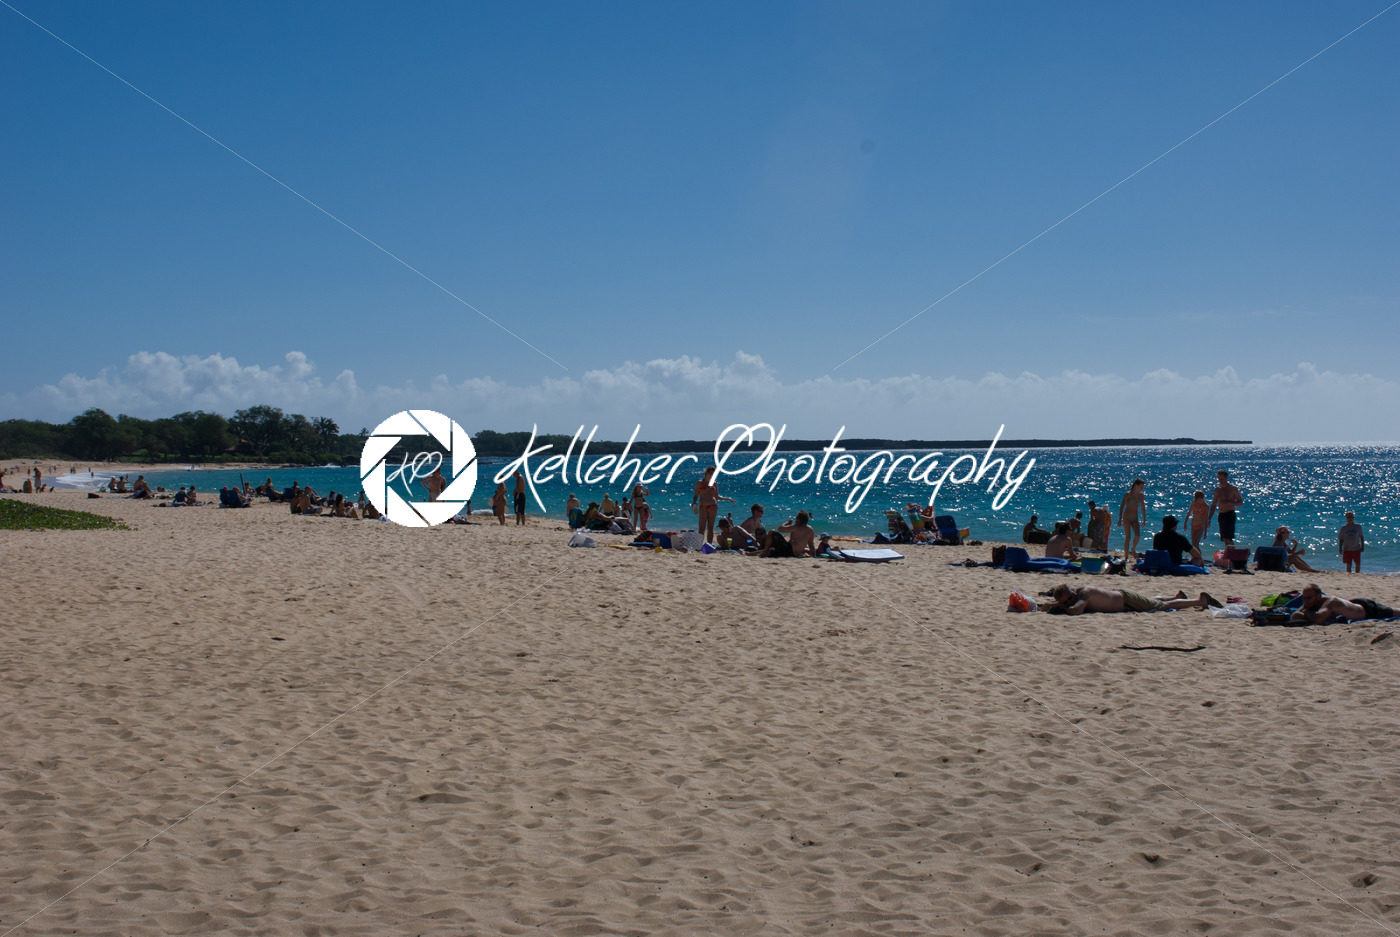 Beach Life At Mokapu Park On The Hawaiian Island Of Maui